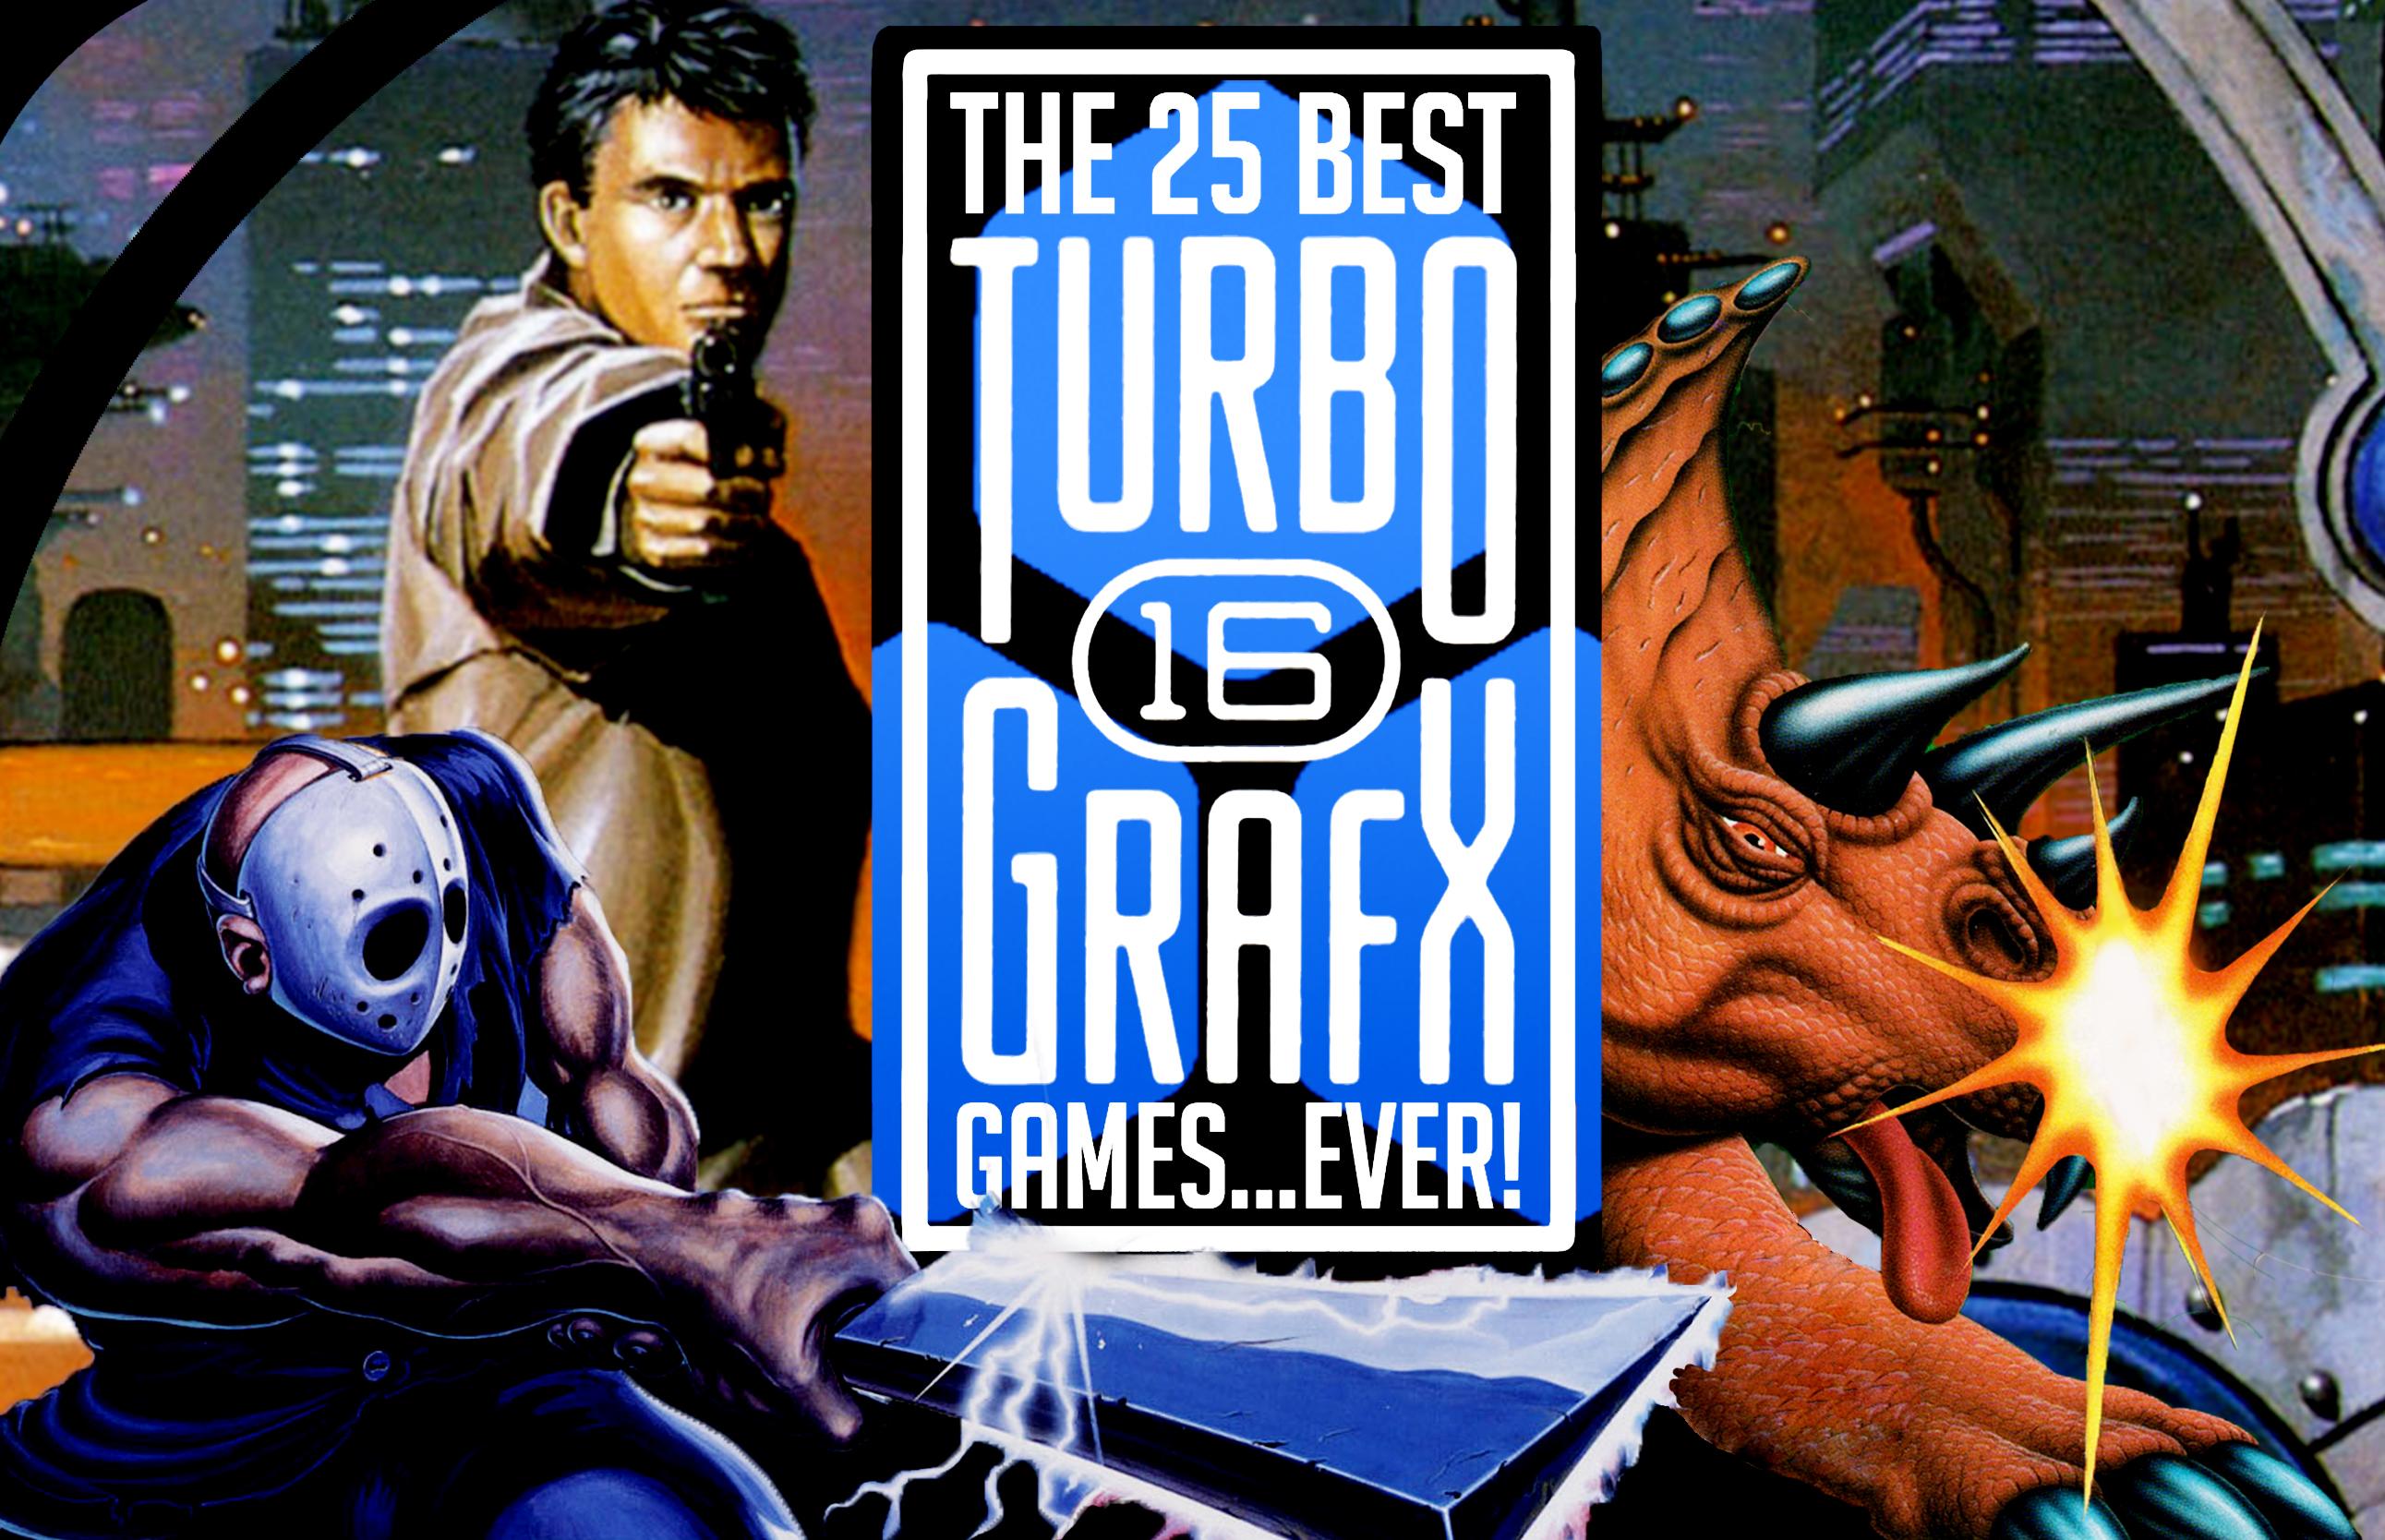 Best Turbgrapfx 16 games